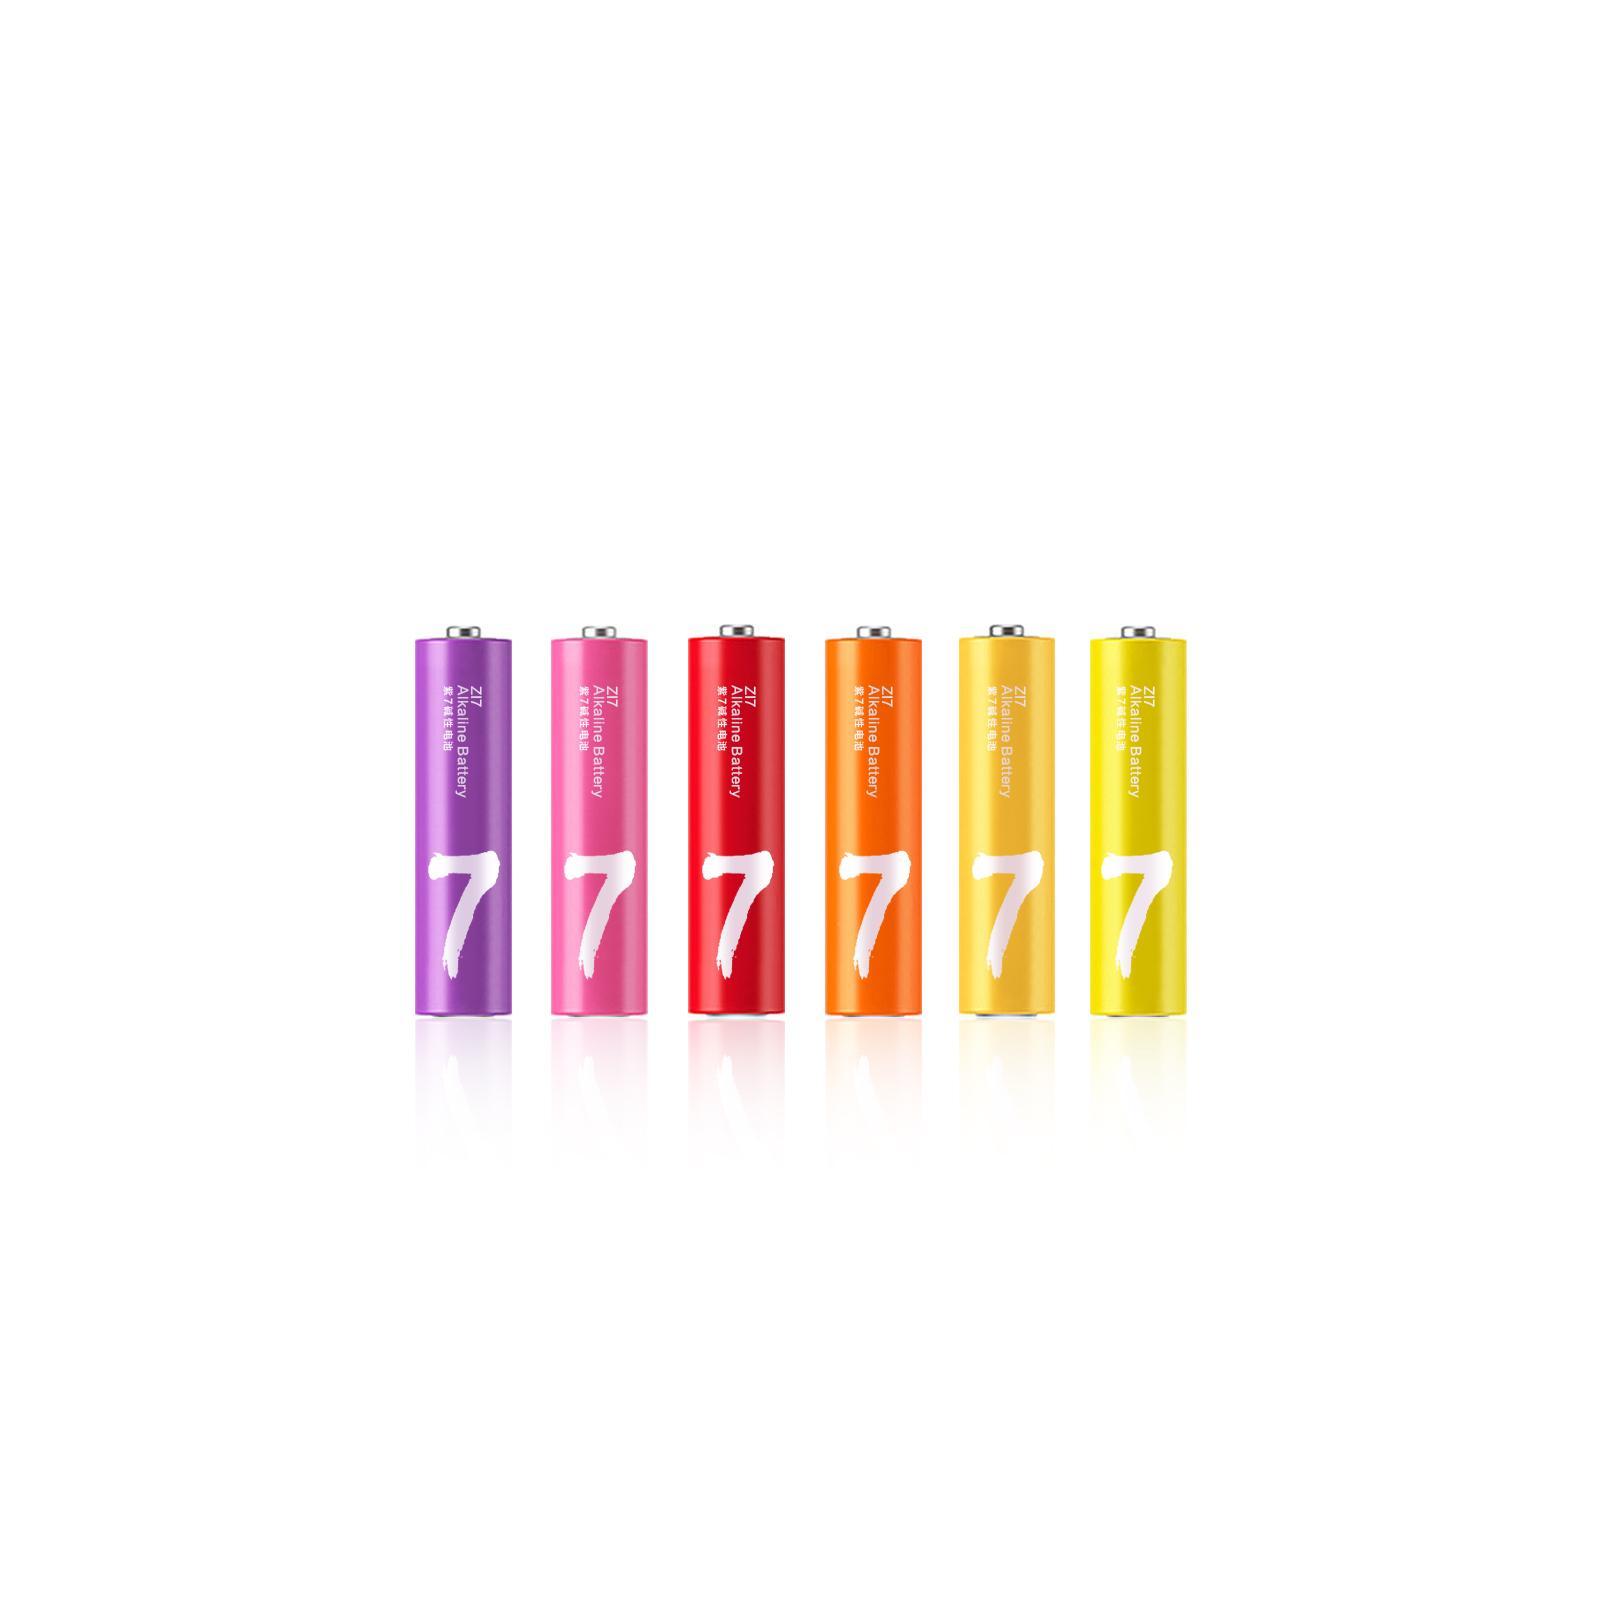 Батарейка ZMI ZI7 Rainbow AAA batteries * 40 (Ф01153) изображение 2